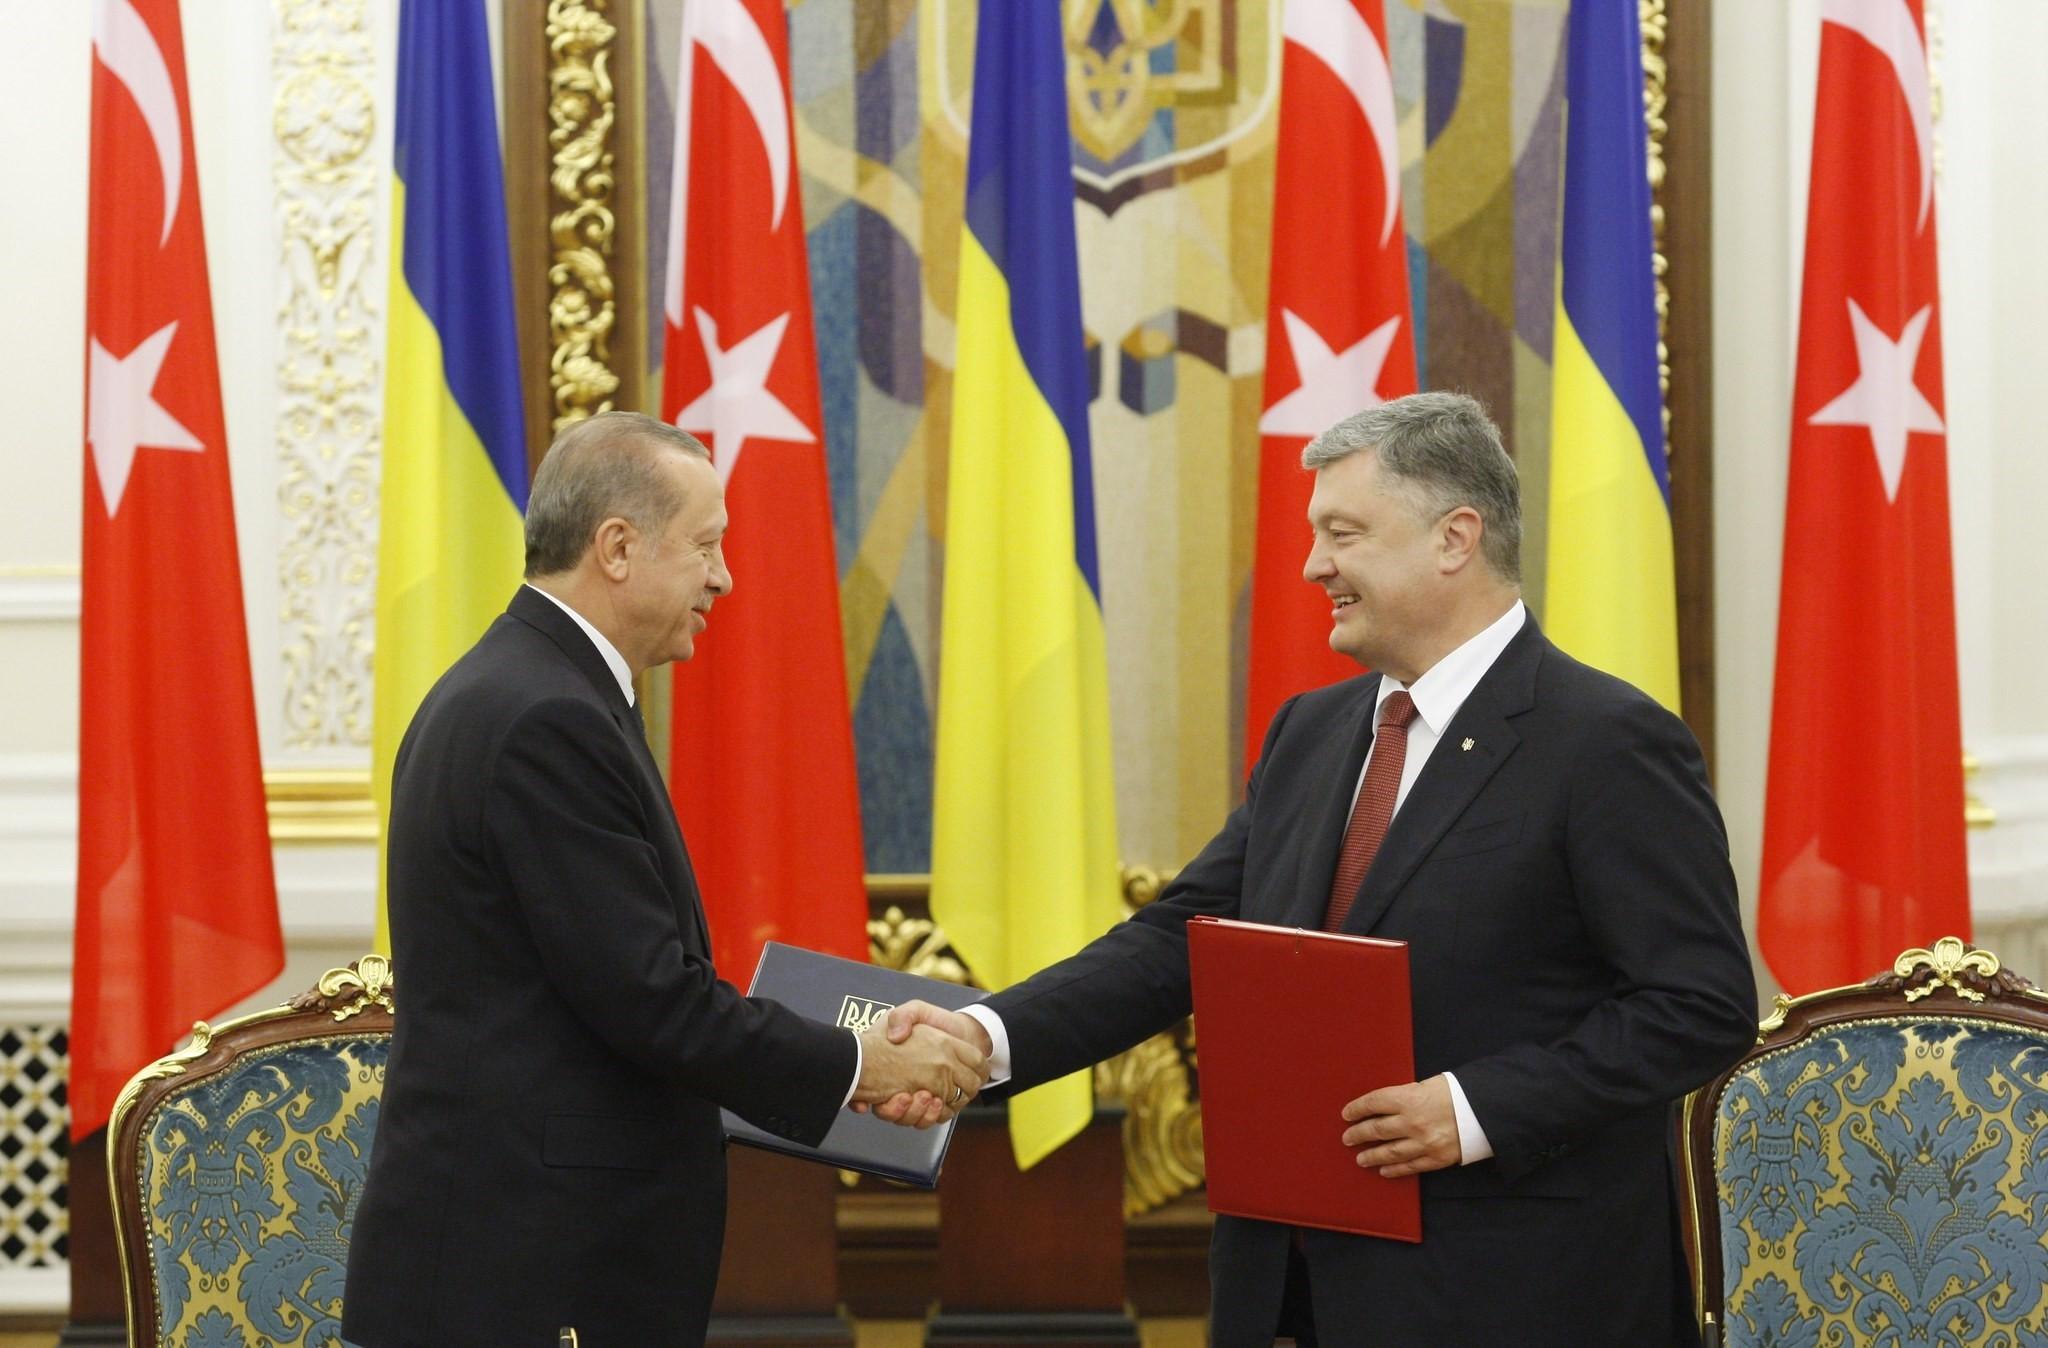 President Erdou011fan (L) and Ukrainian President Poroshenko shake hands after signing bilateral agreements  following their meeting in Kiev, Ukraine, Oct. 9.